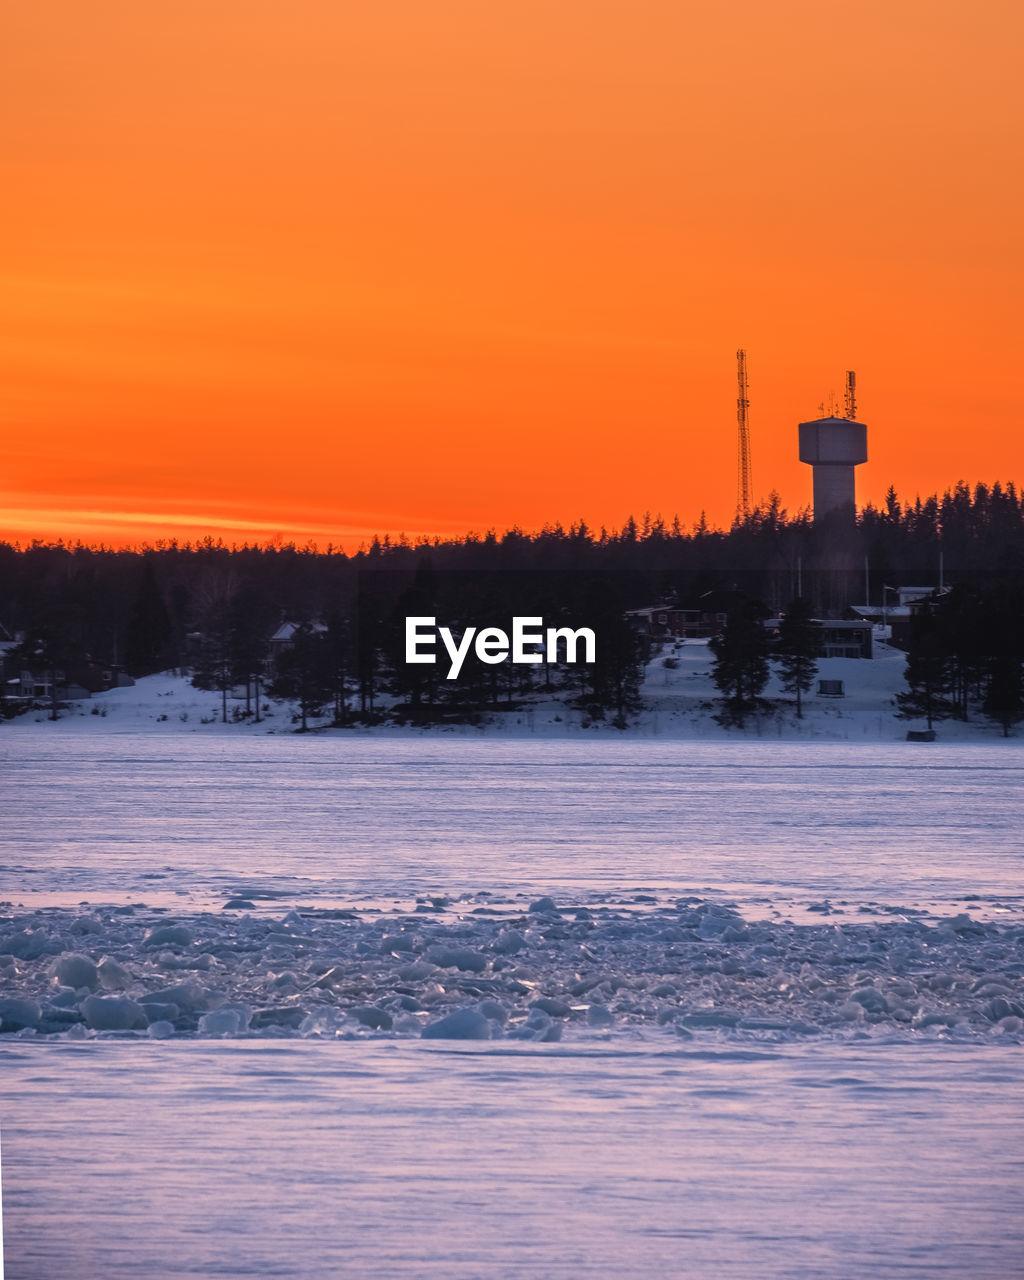 SCENIC VIEW OF ORANGE SKY DURING WINTER